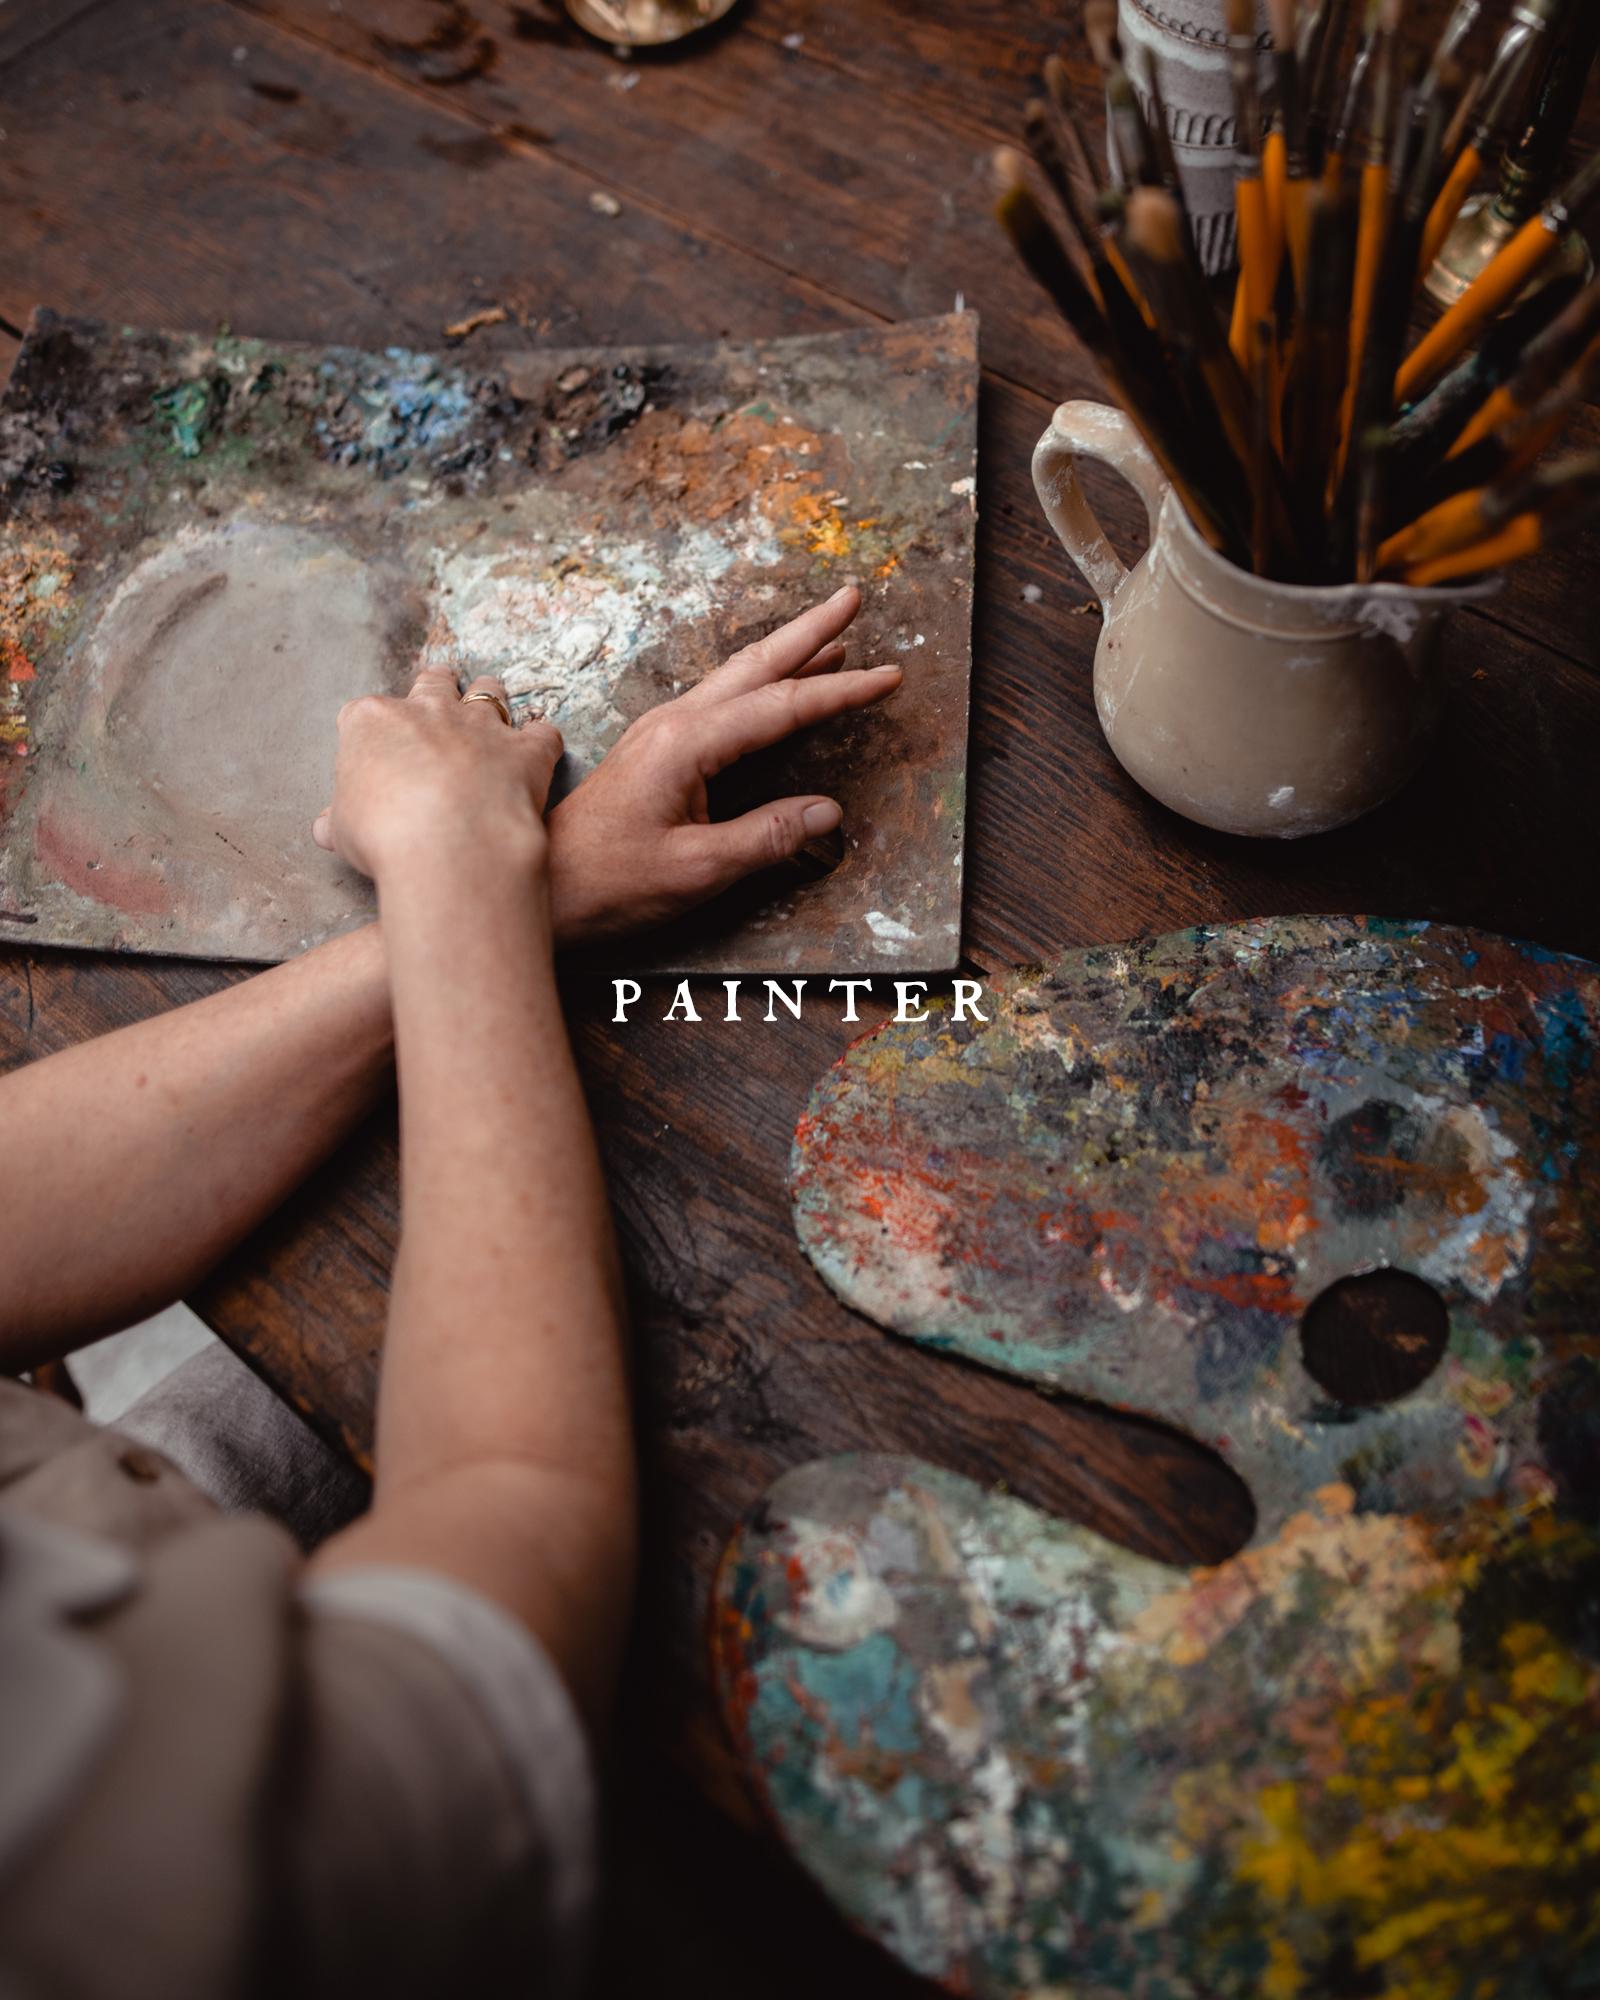 painter1.jpg